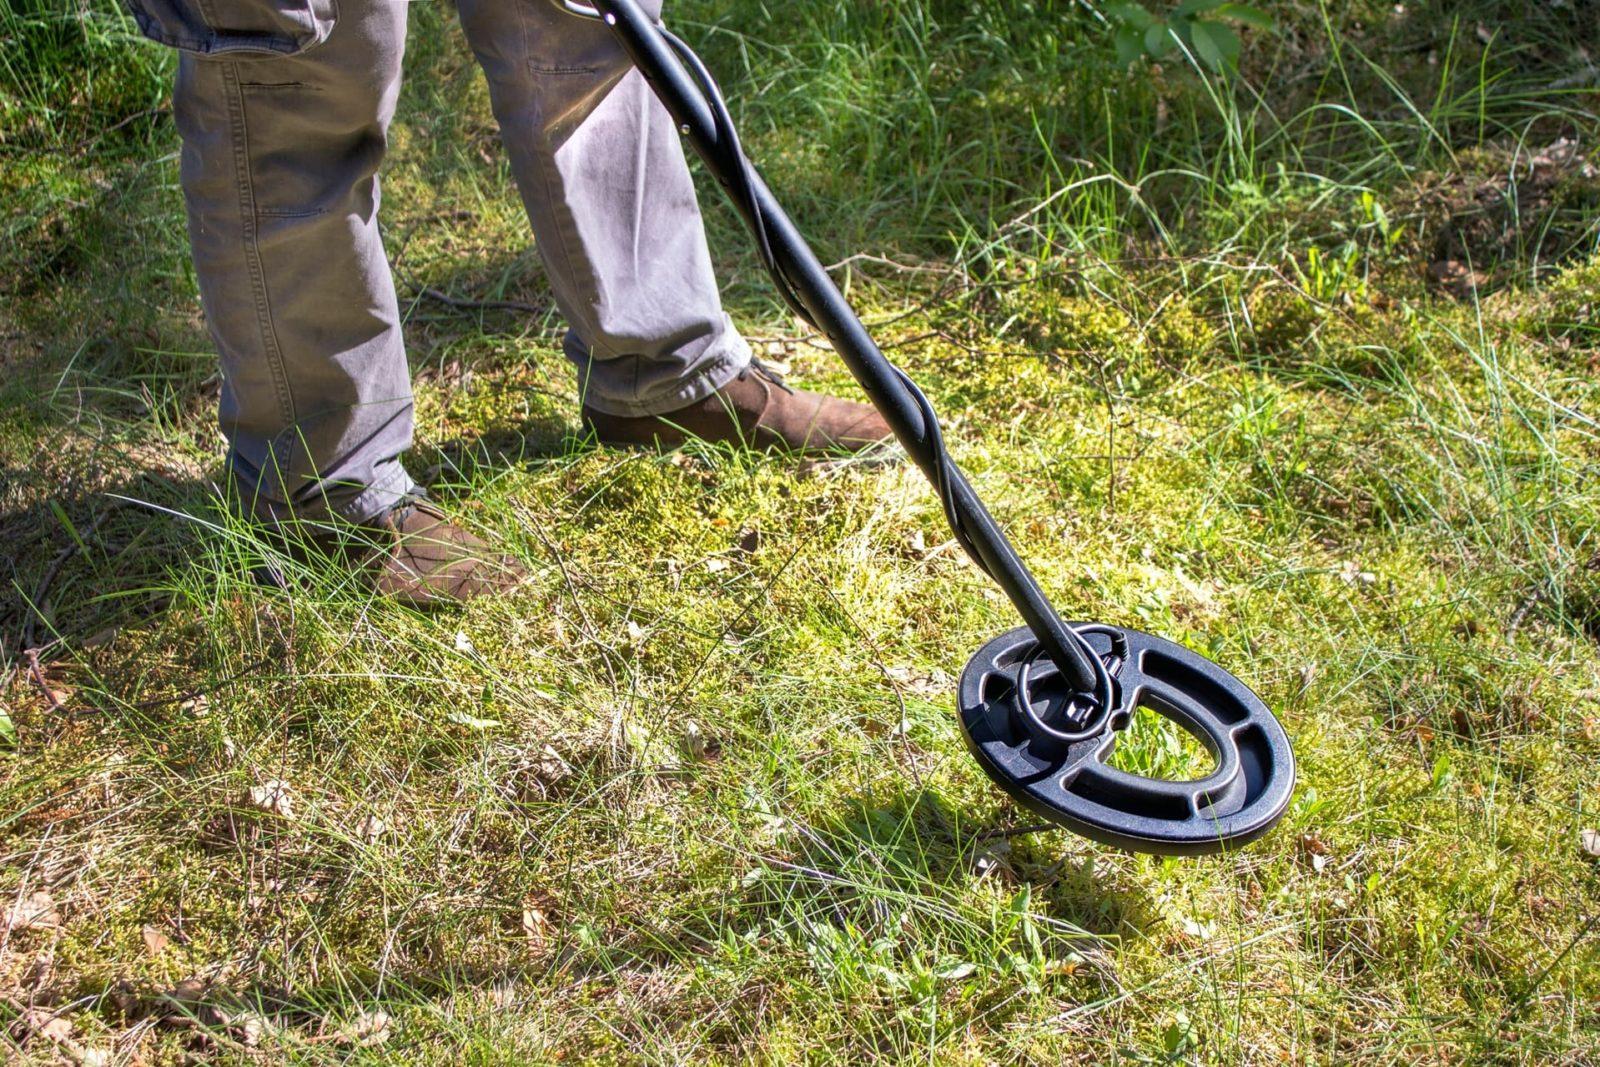 man using metal detector over grass field